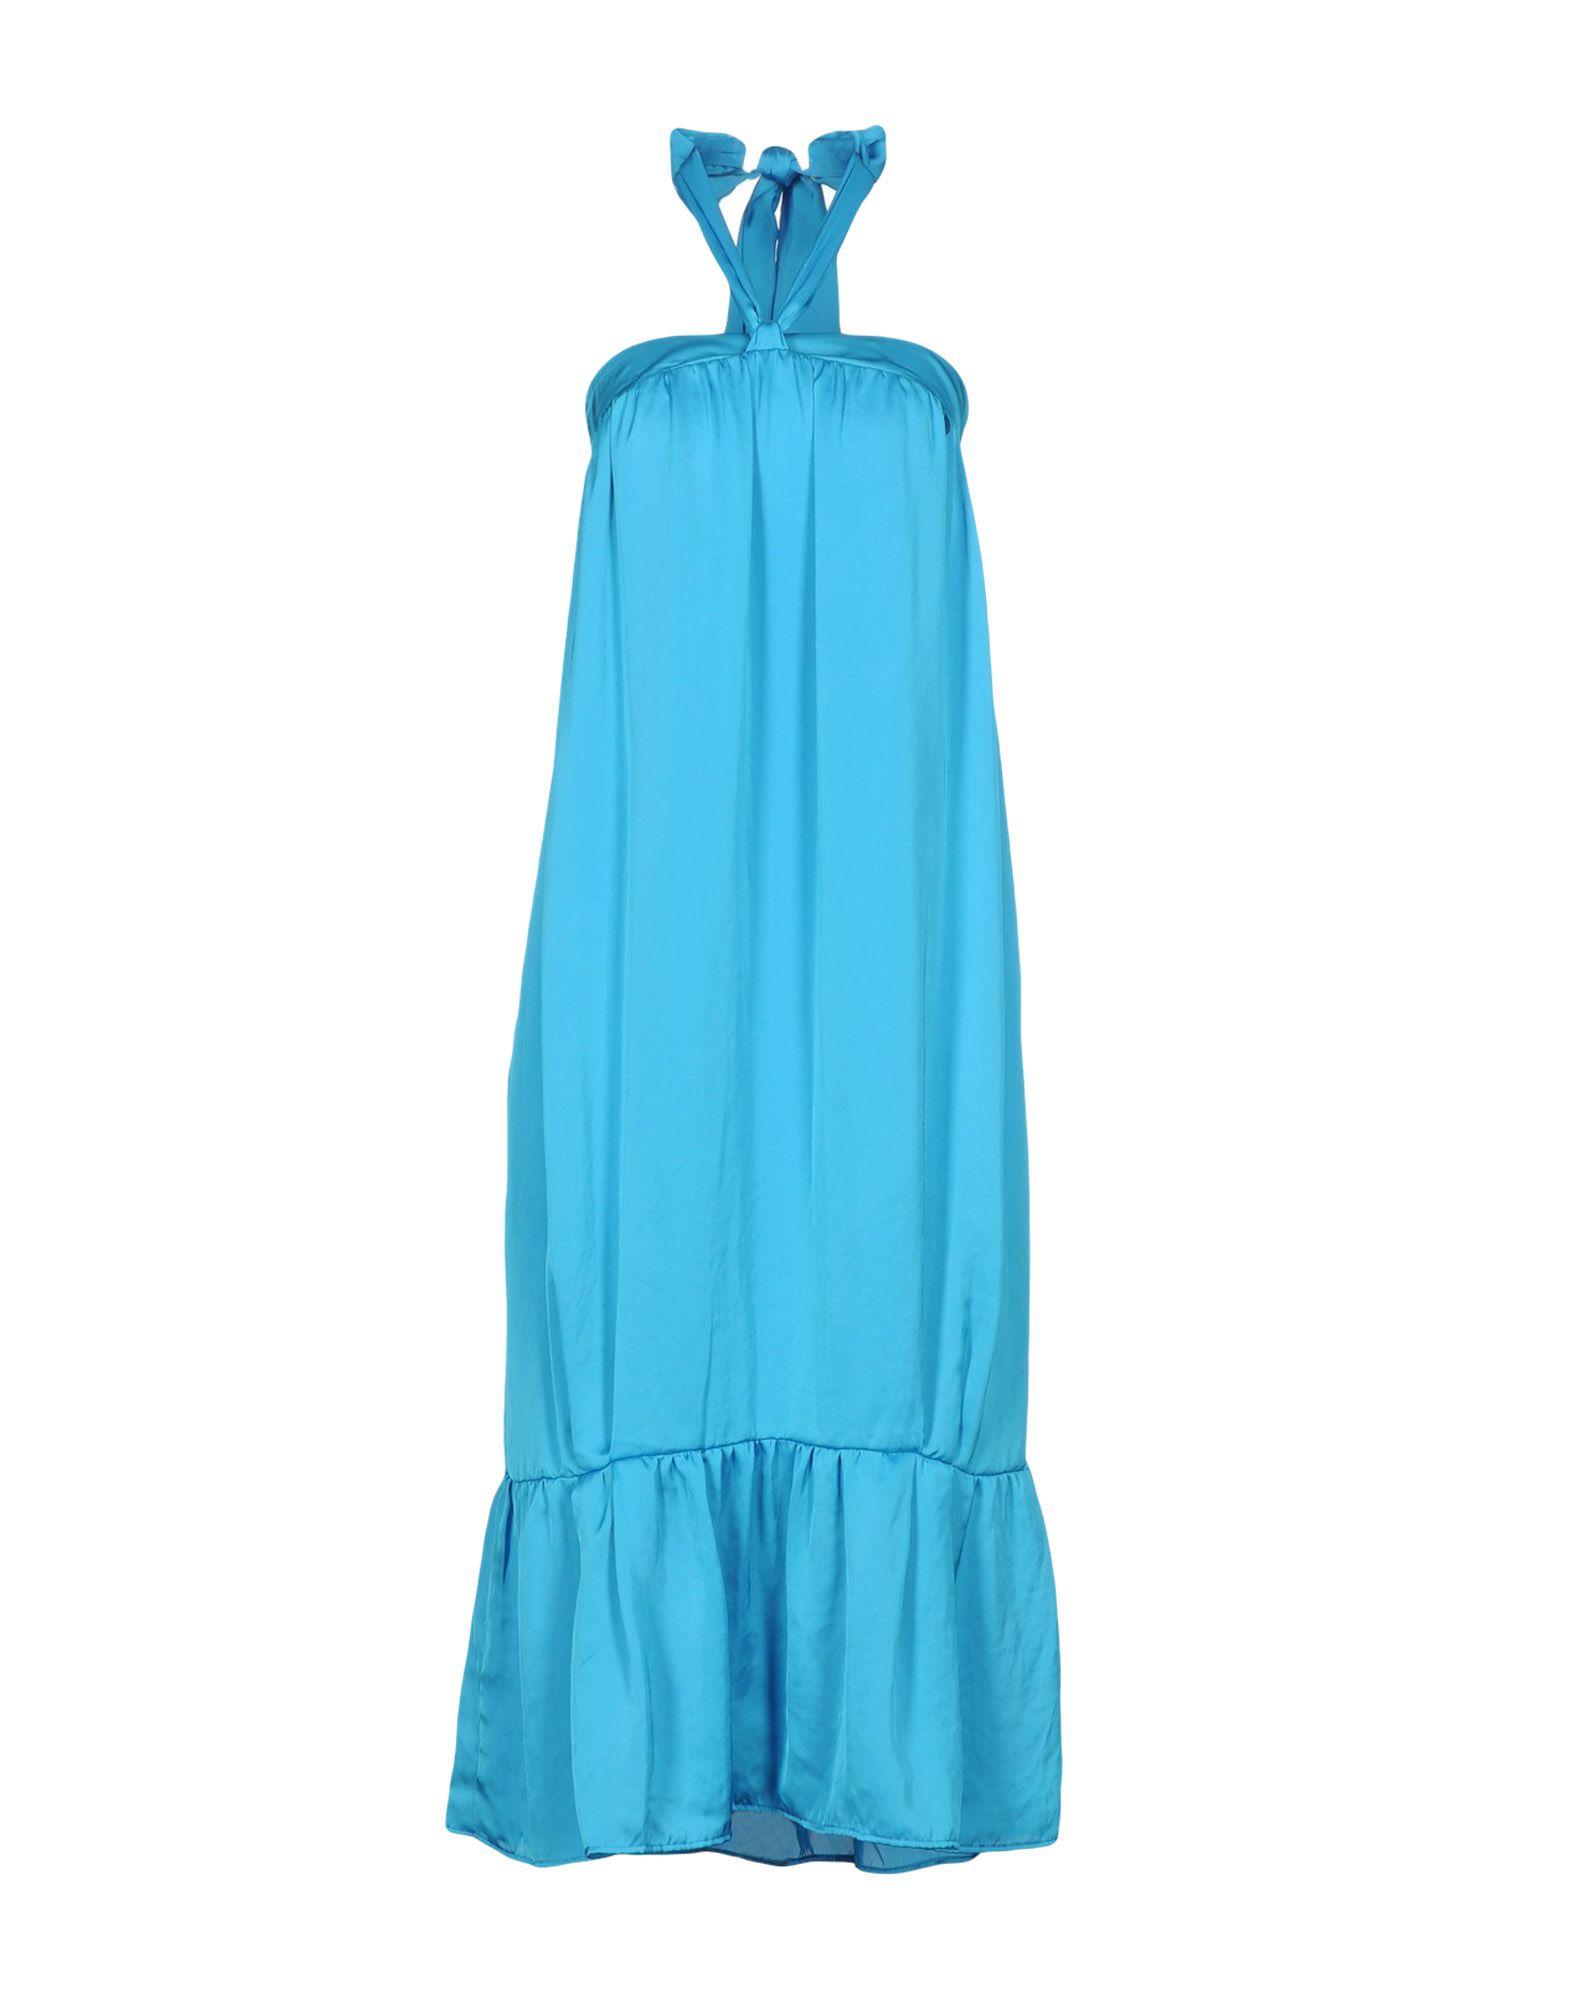 TWIN-SET Simona Barbieri Платье длиной 3/4 jys 4 twin